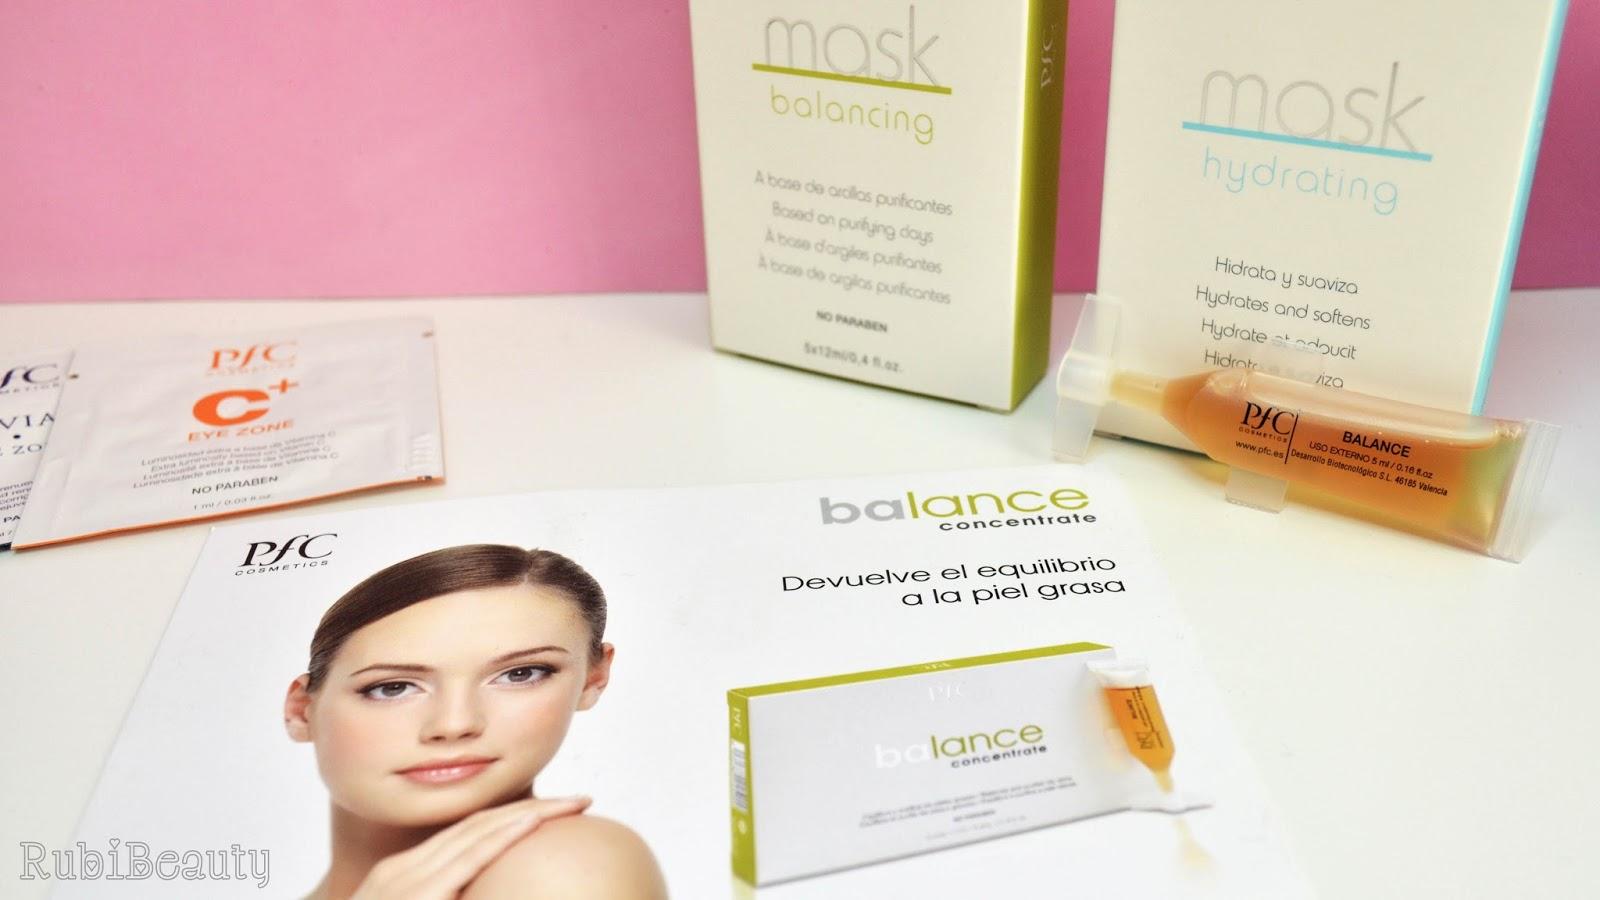 rubibeauty review opinion PFC cosmetics cosmetica profesional piel grasa deshidratada brillos contorno ojos mascarilla serum